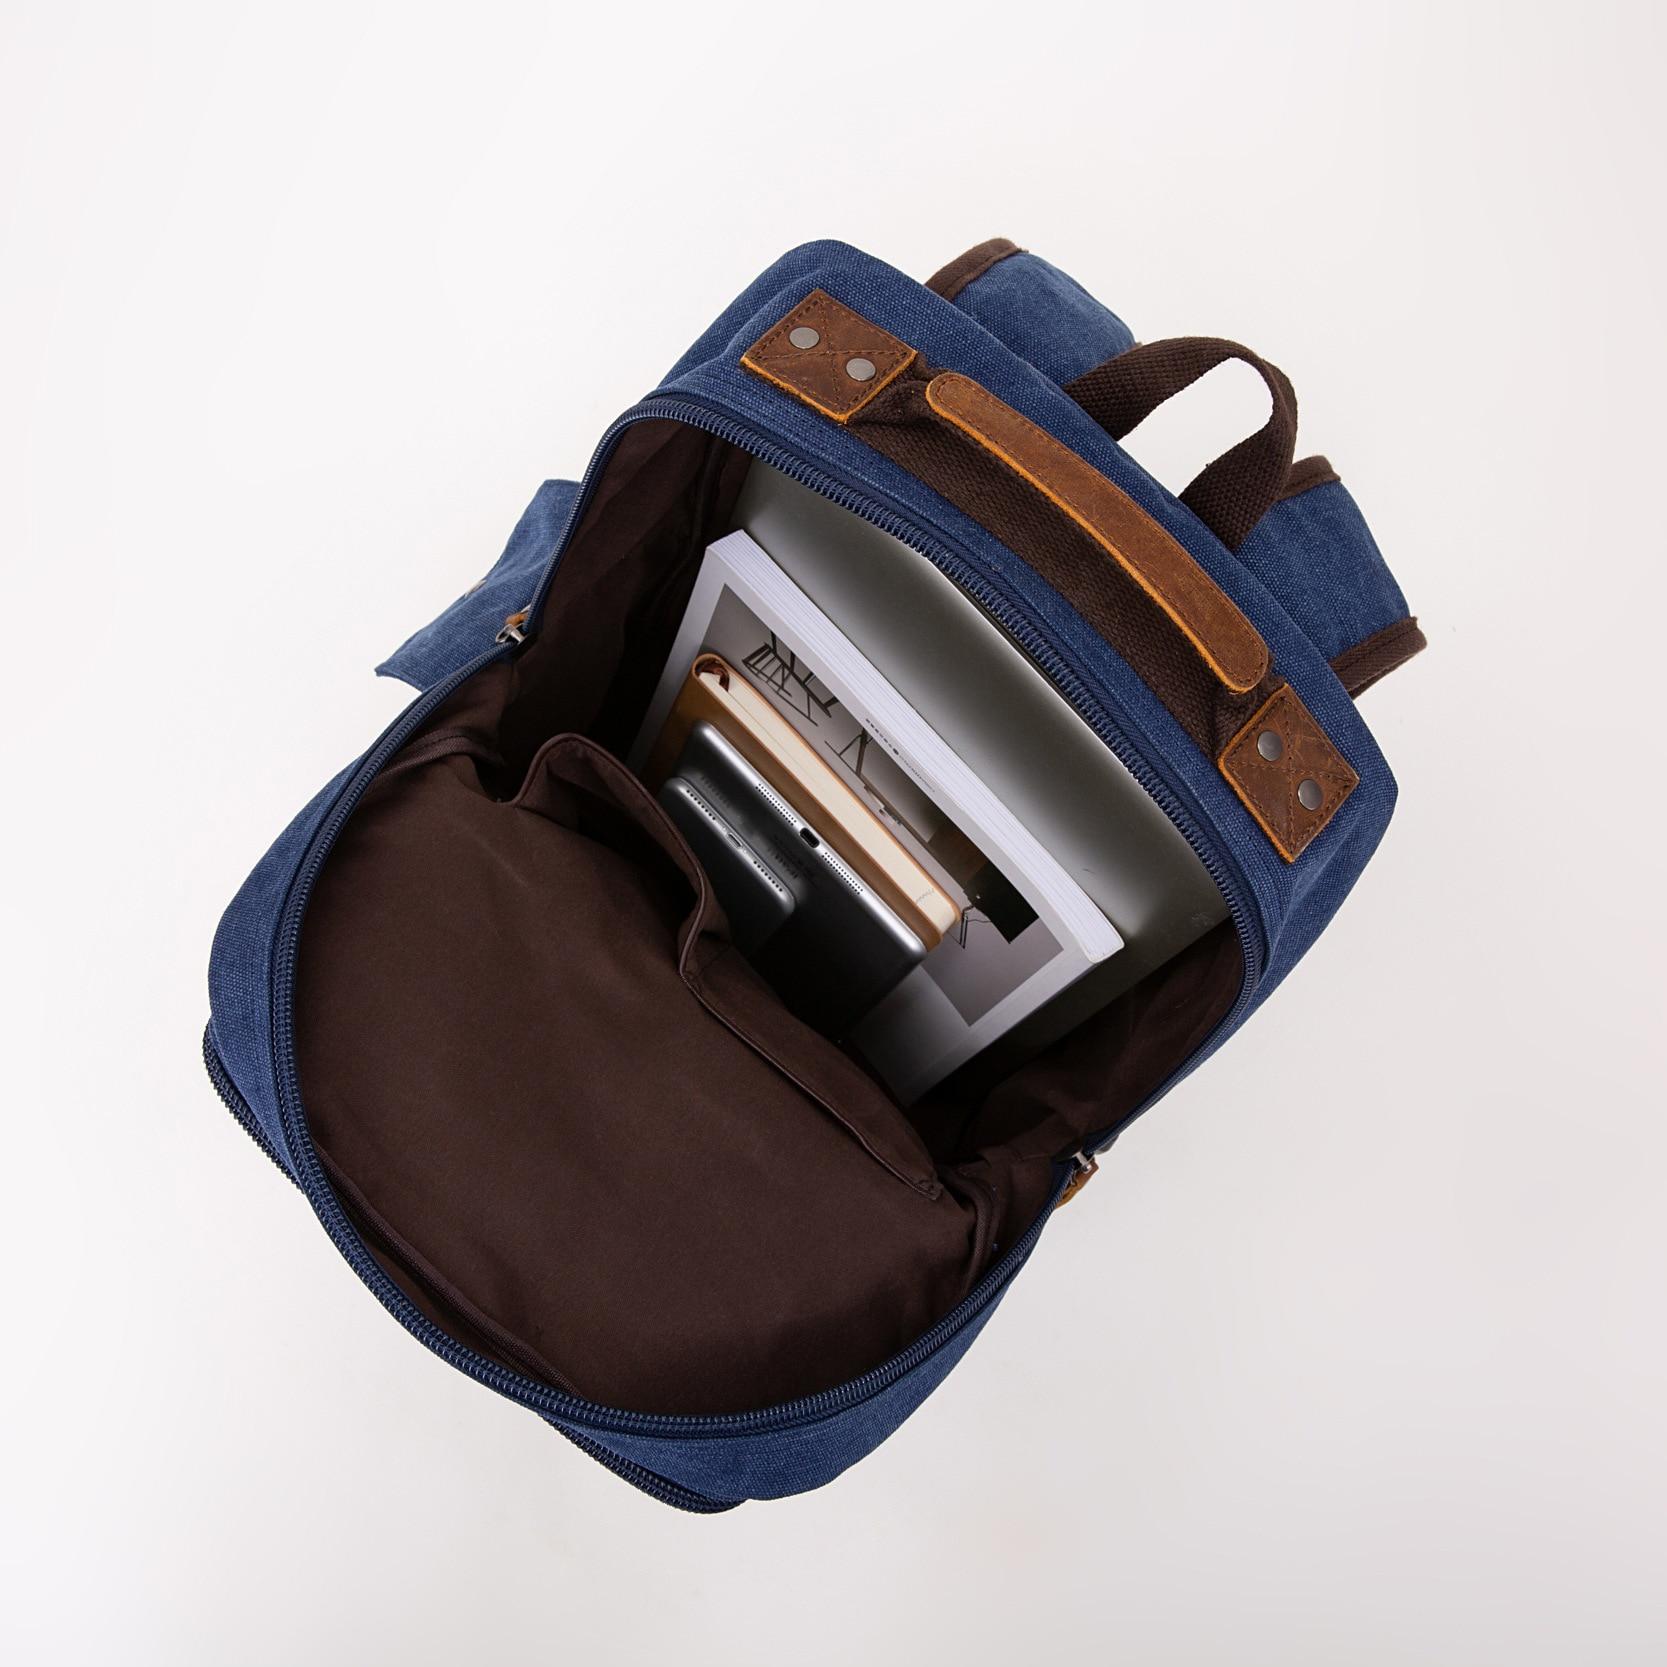 Shoulders Canvas Laptop Anti Theft Backpack Men Women Mochila Mujer Bagpack School Bags For Teenage Girls Backpacks